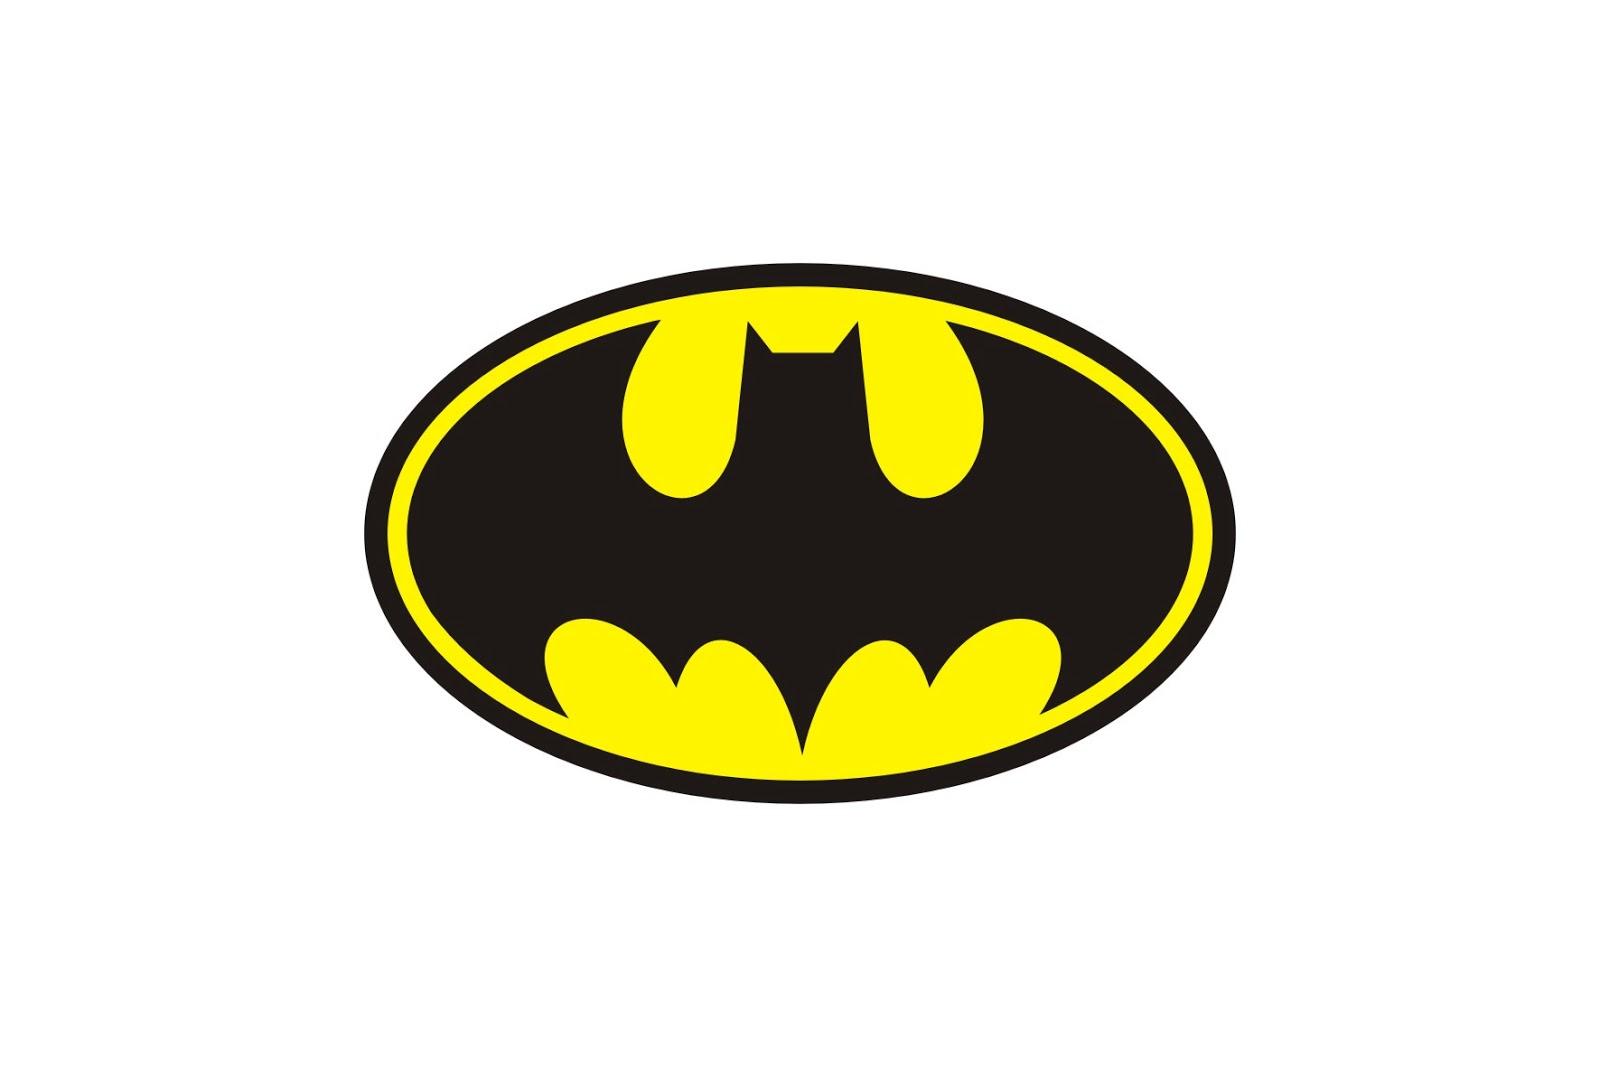 Batman logo template cake ideas and designs for Batman logo cake template